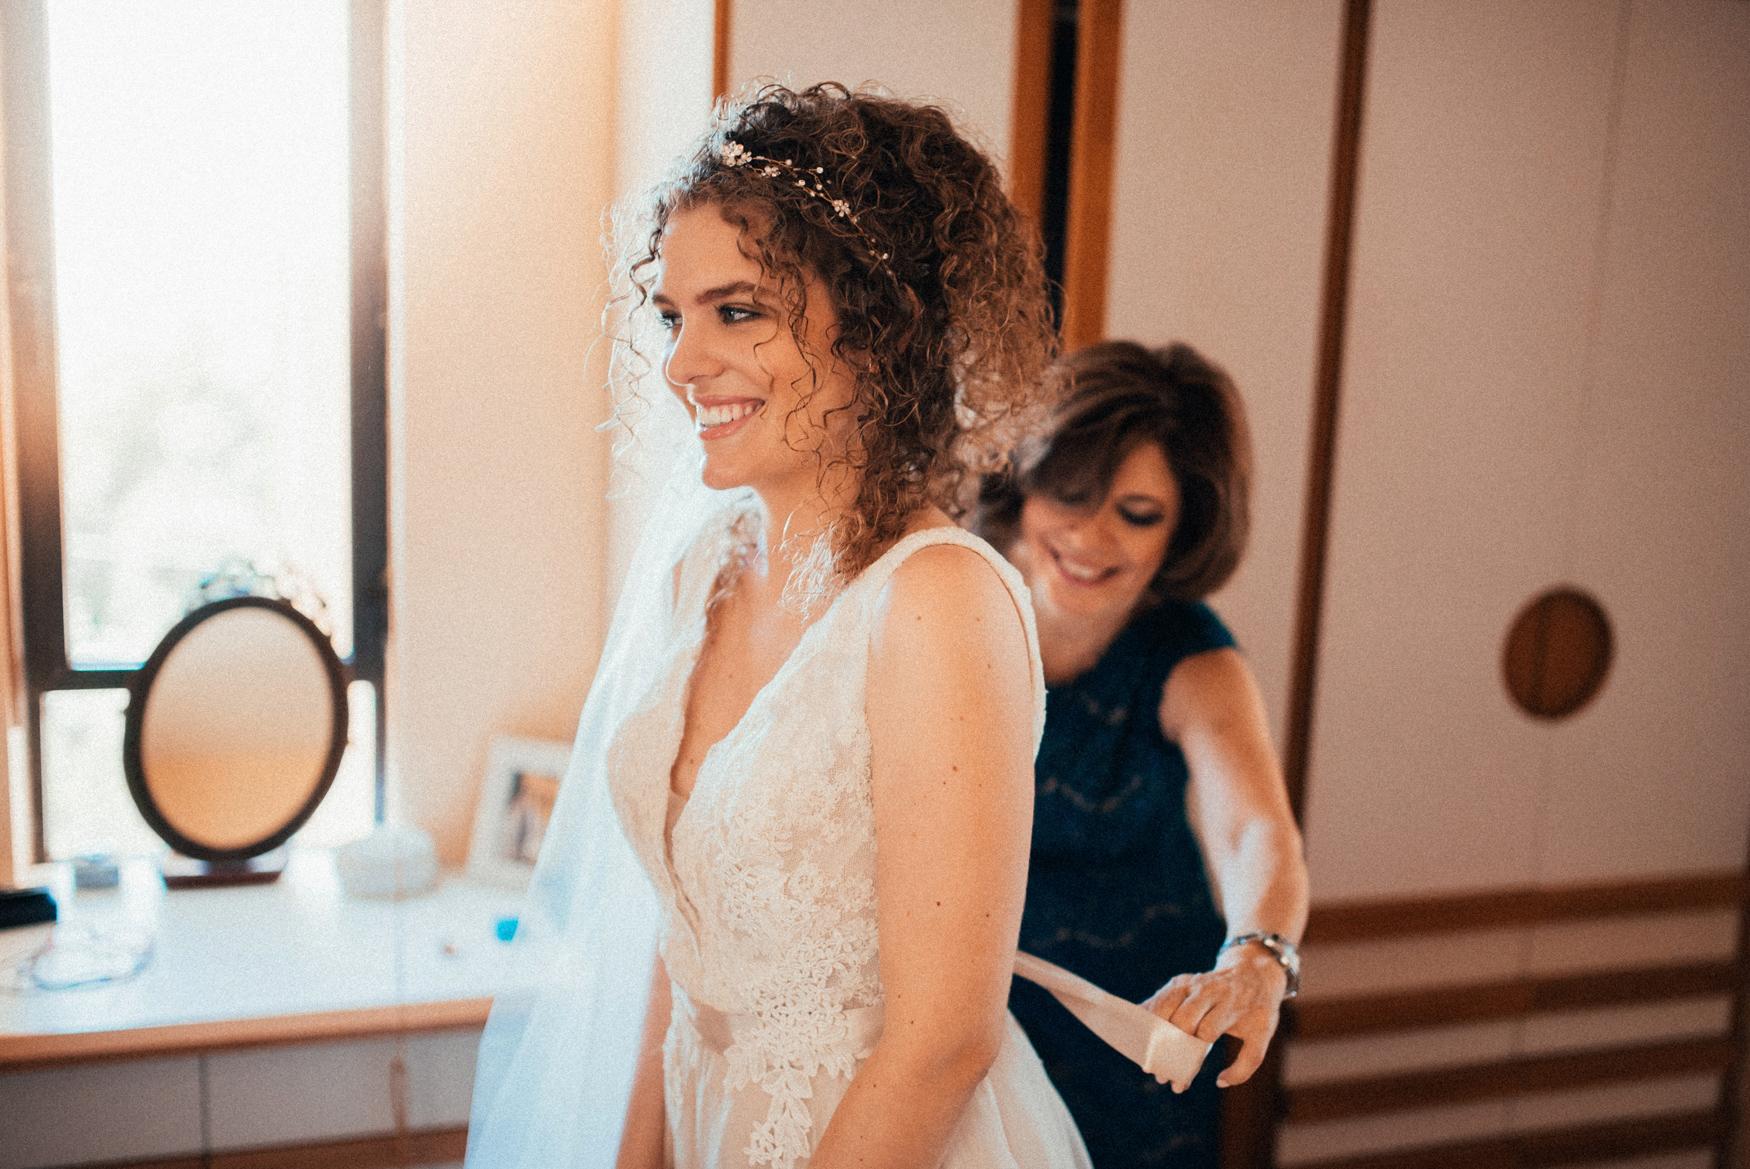 LR2 beirut byblos wedding photographer lebanon 017.jpg